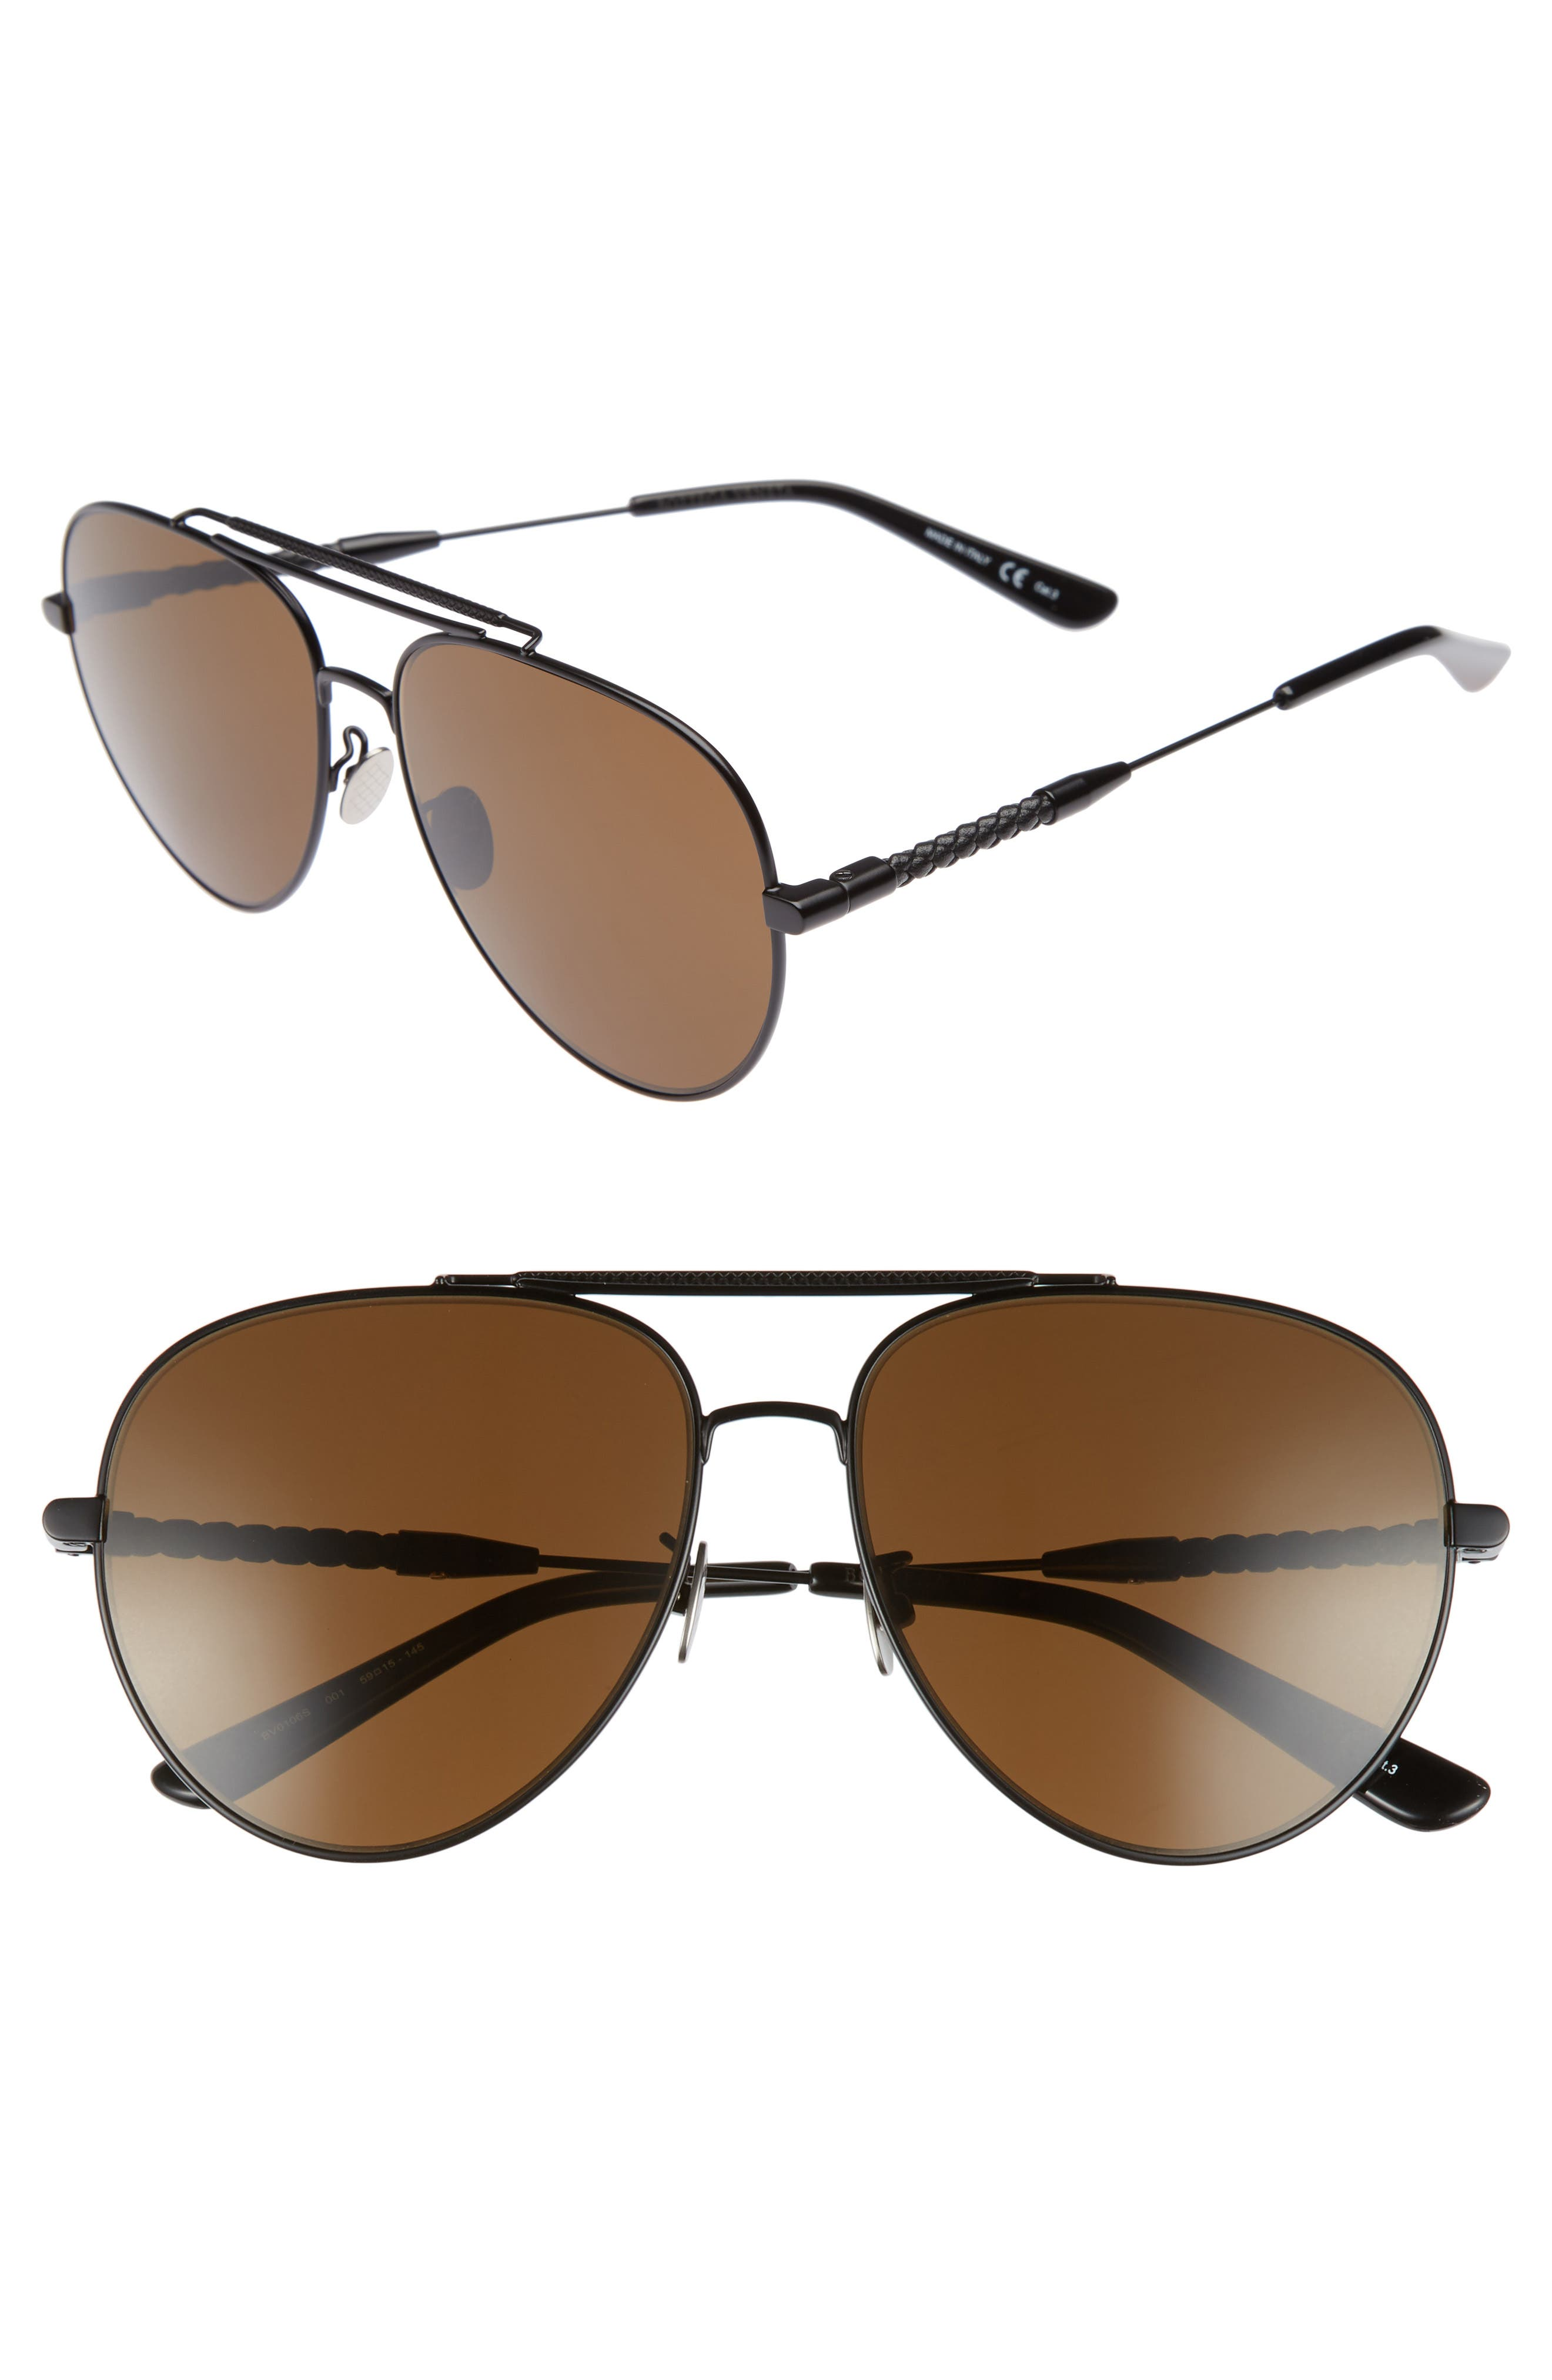 Alternate Image 1 Selected - Bottega Veneta 59mm Aviator Sunglasses